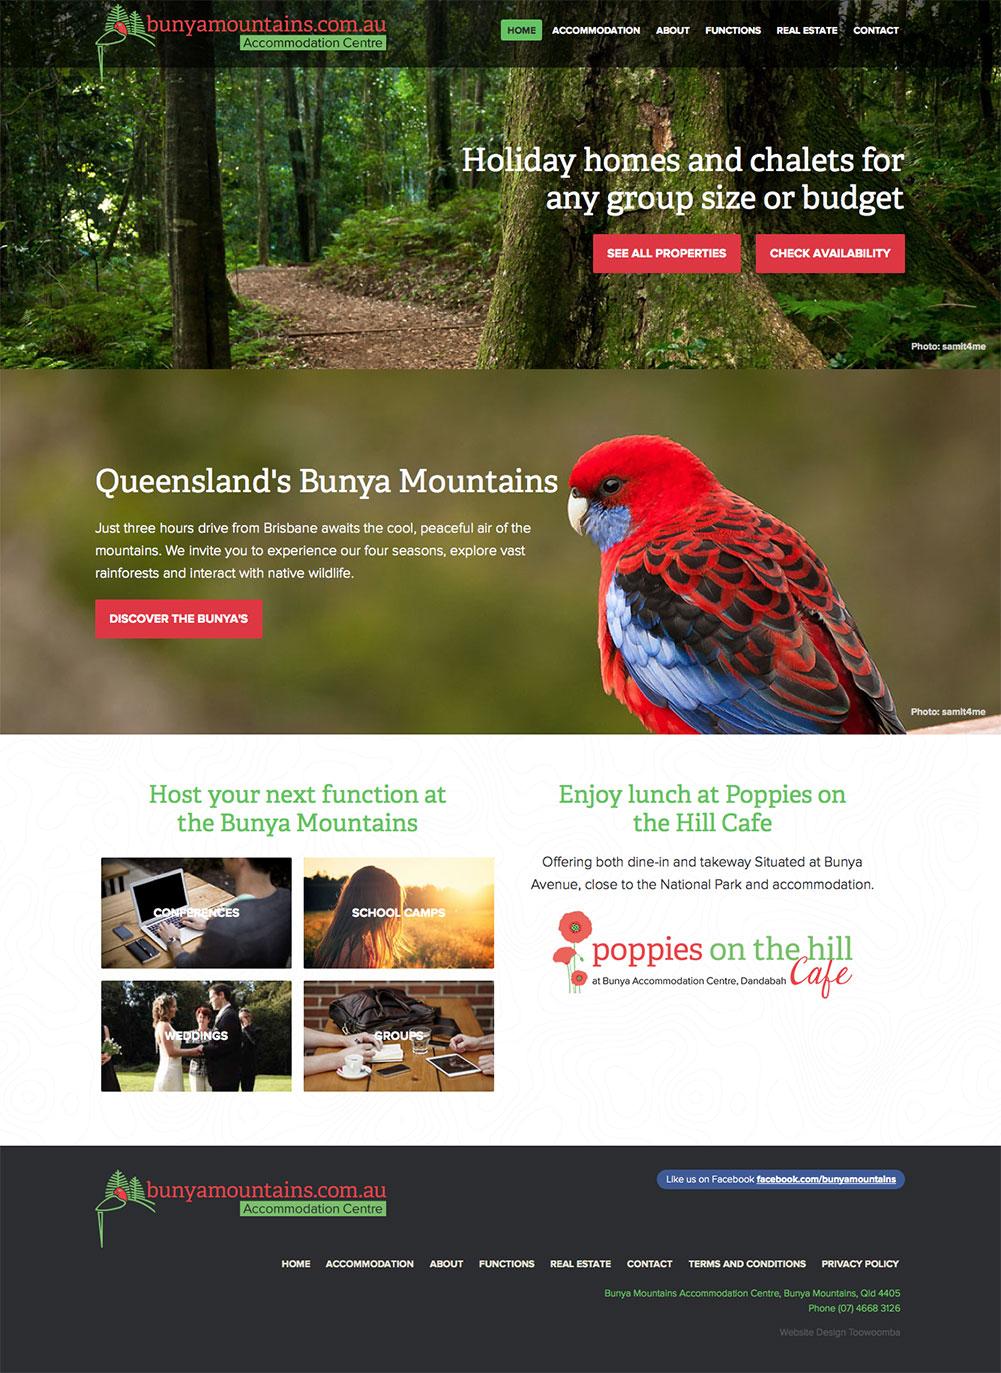 Bunya Mountains Accommodation Centre Website